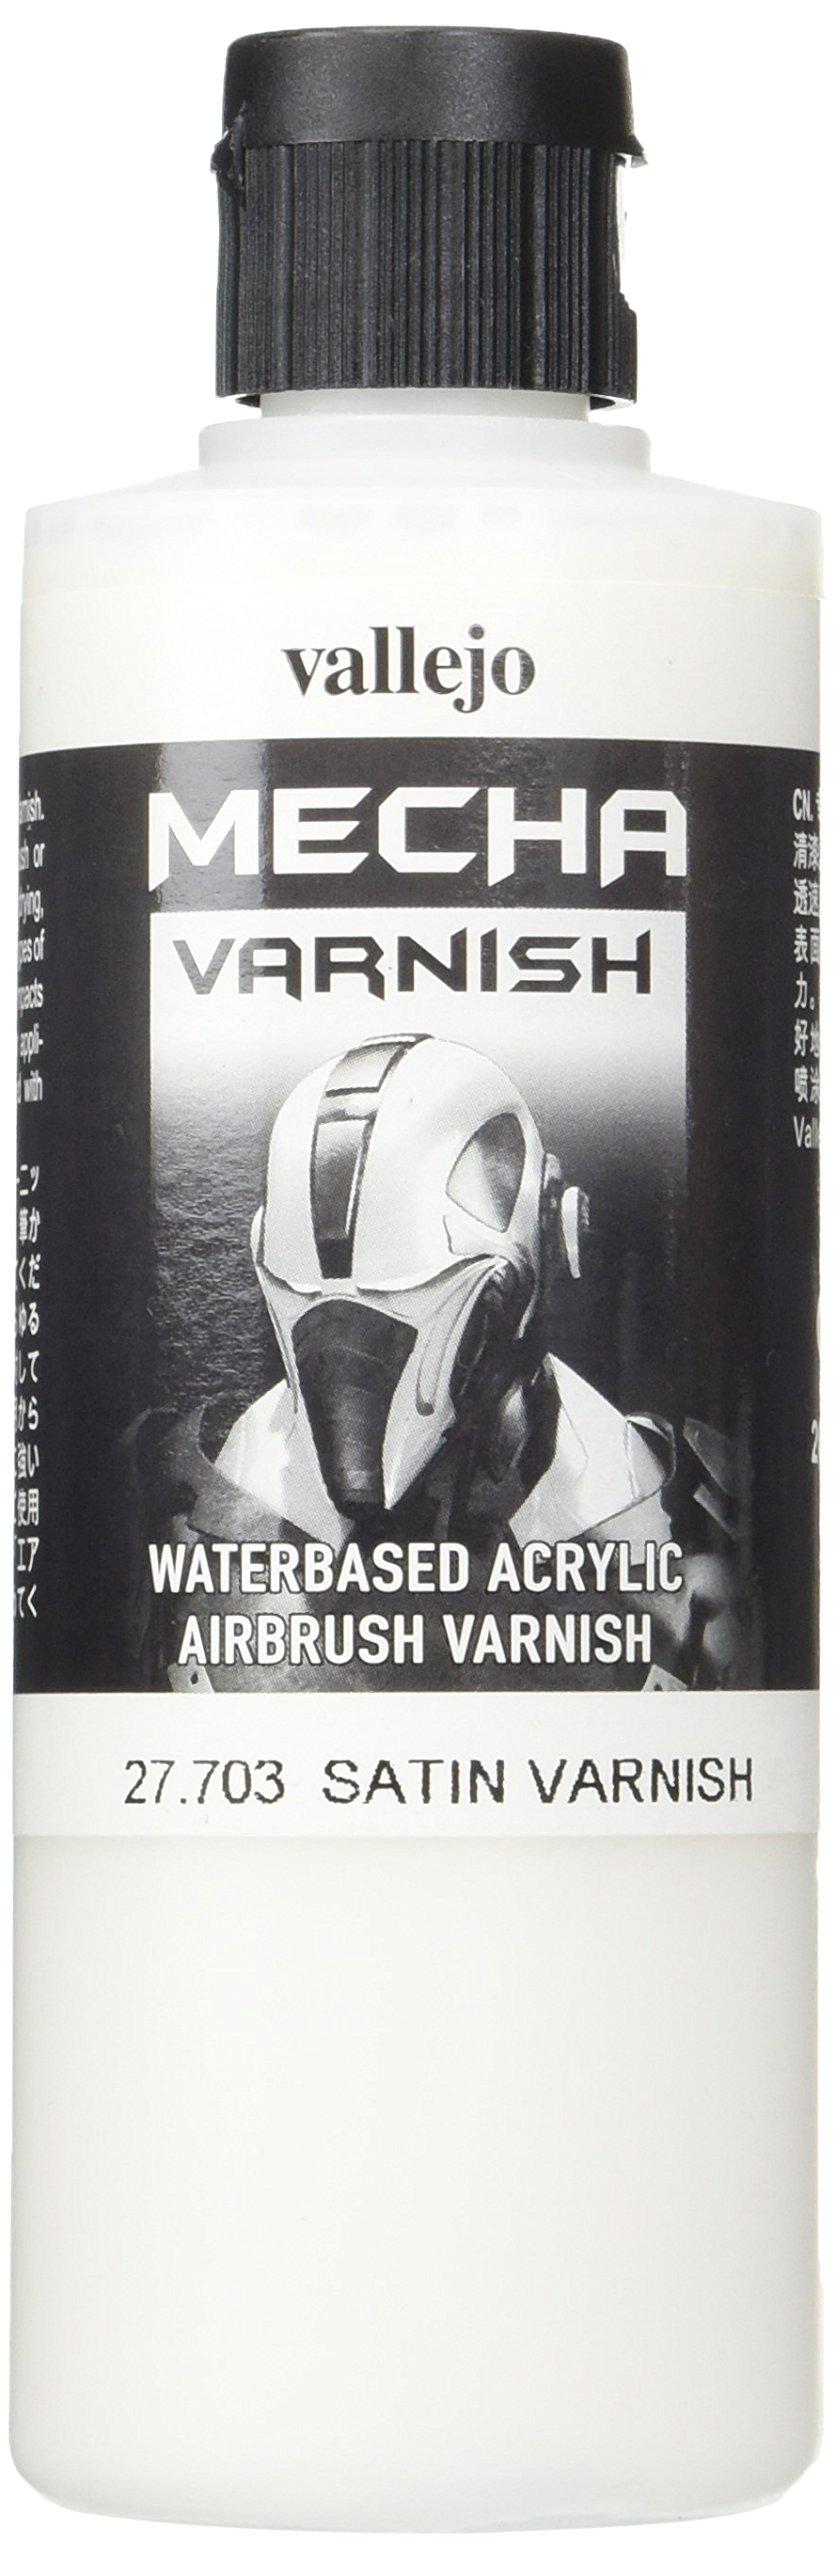 Vallejo Mecha Satin Varnish 200ml Painting Accessories